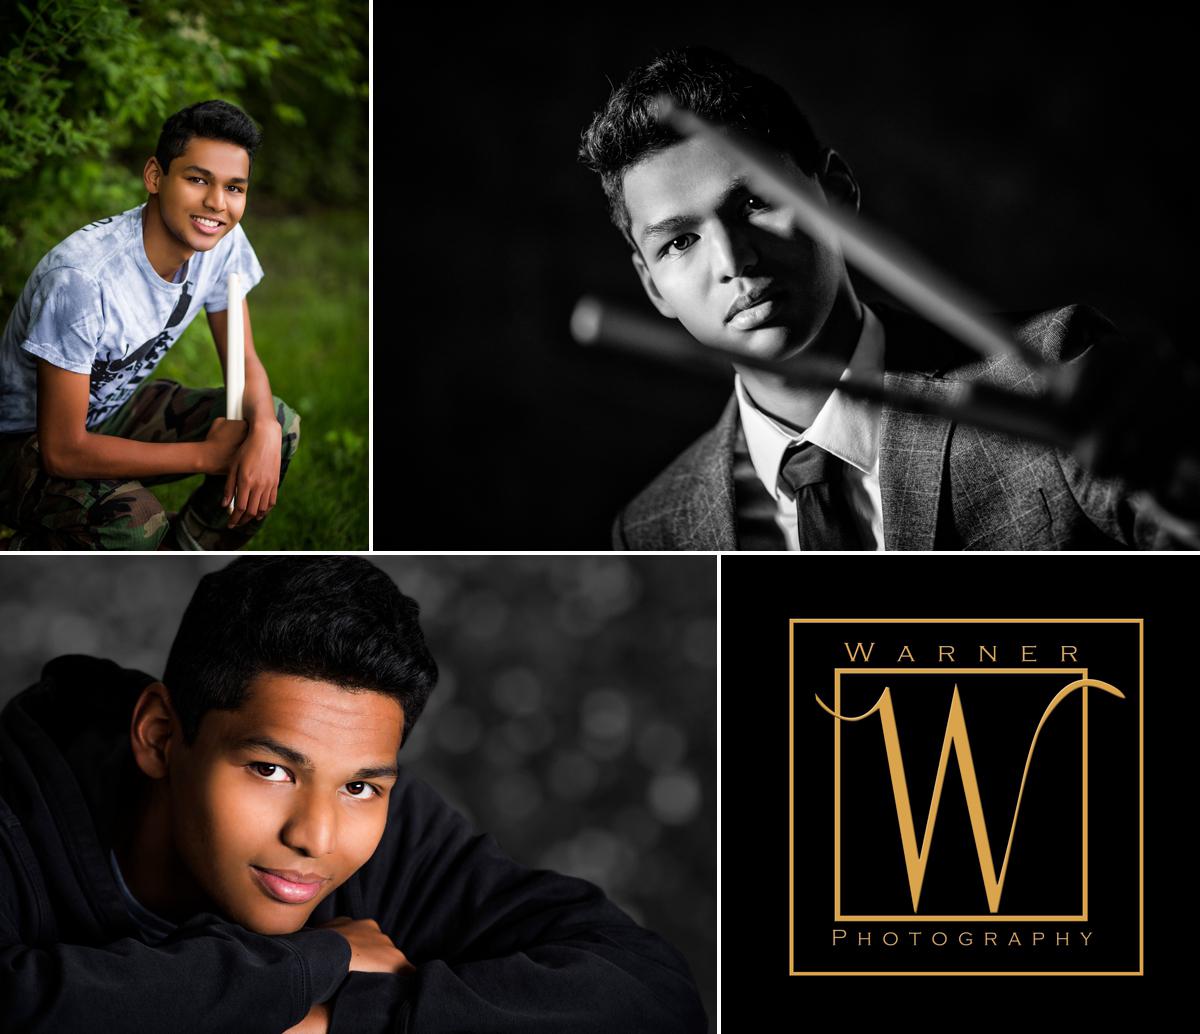 Brandan-senior-collage-warner-photography-midland-michigan